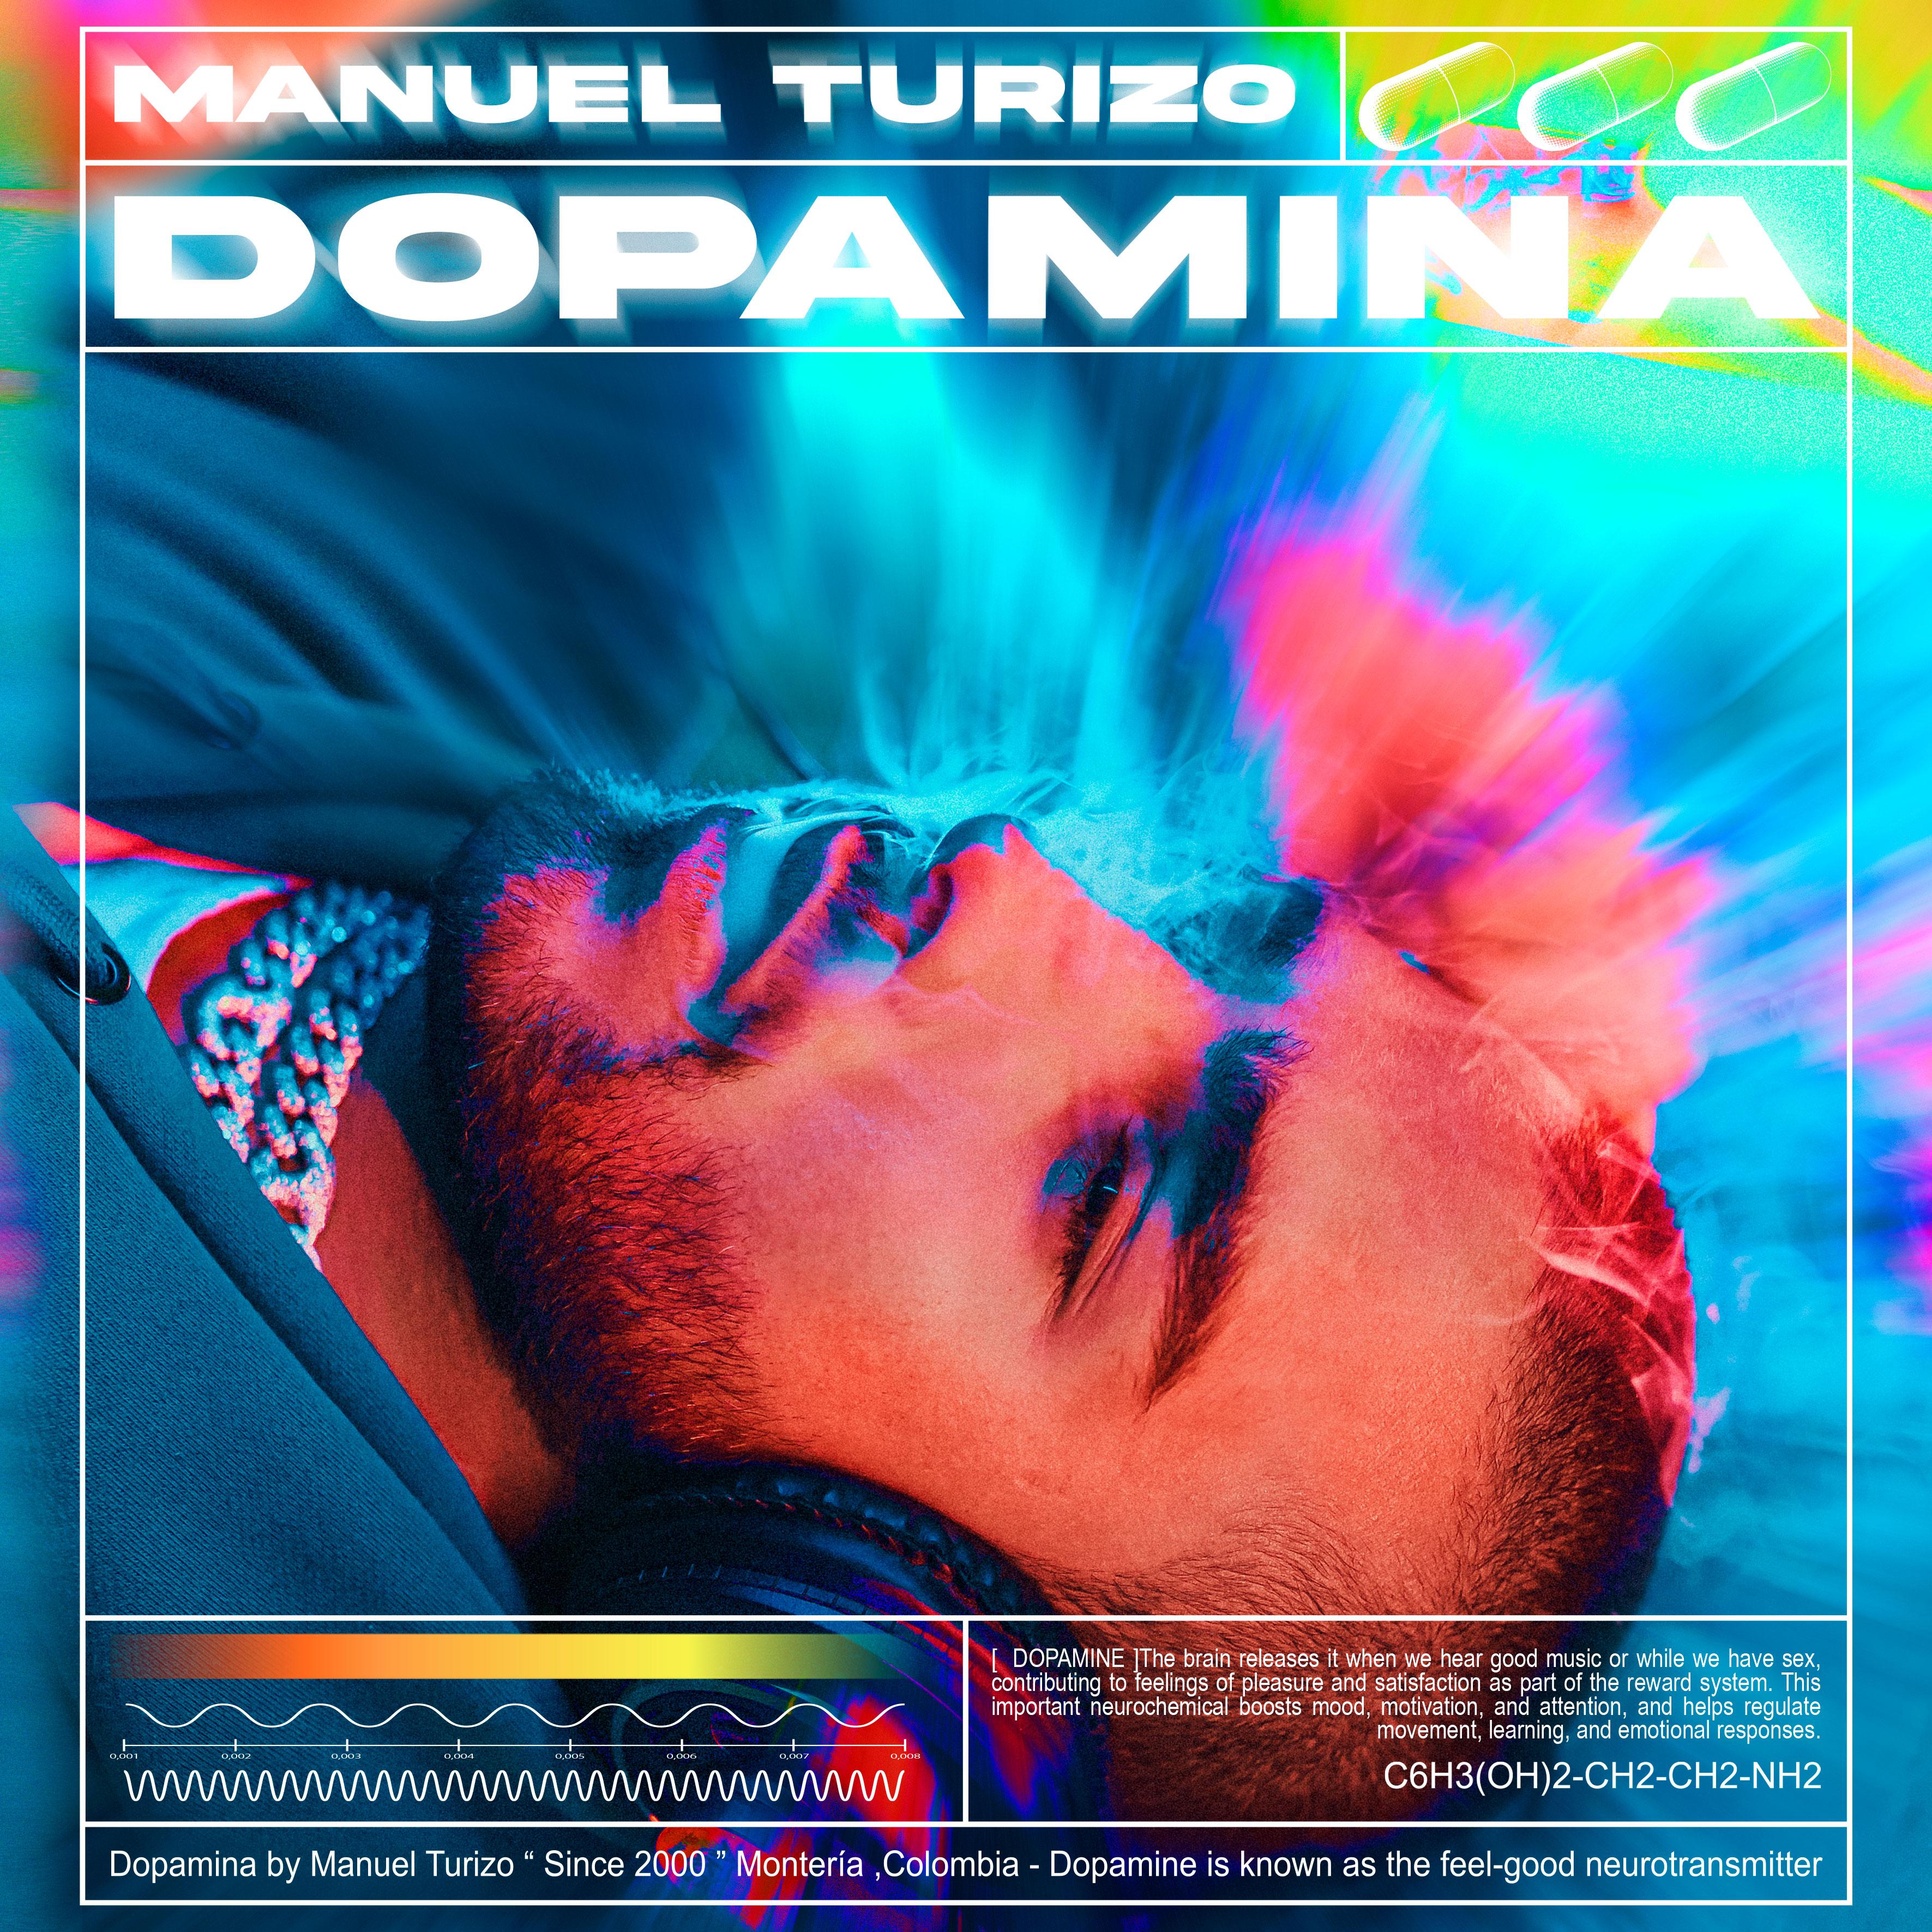 ManuelTurizo-Dopamina